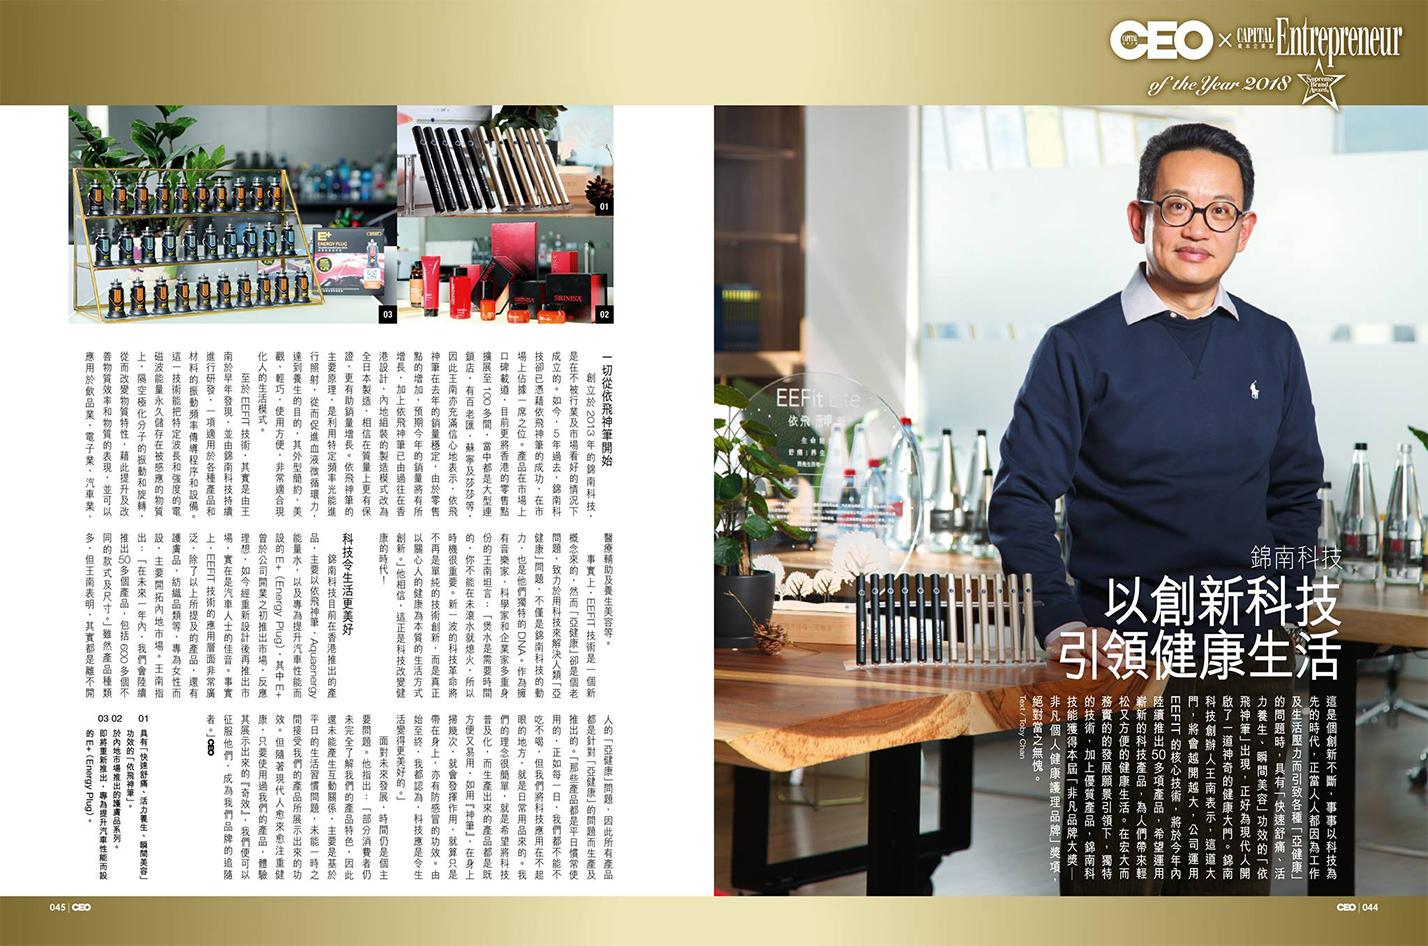 CEO X CAPITAL 獎項 – 依飛神筆